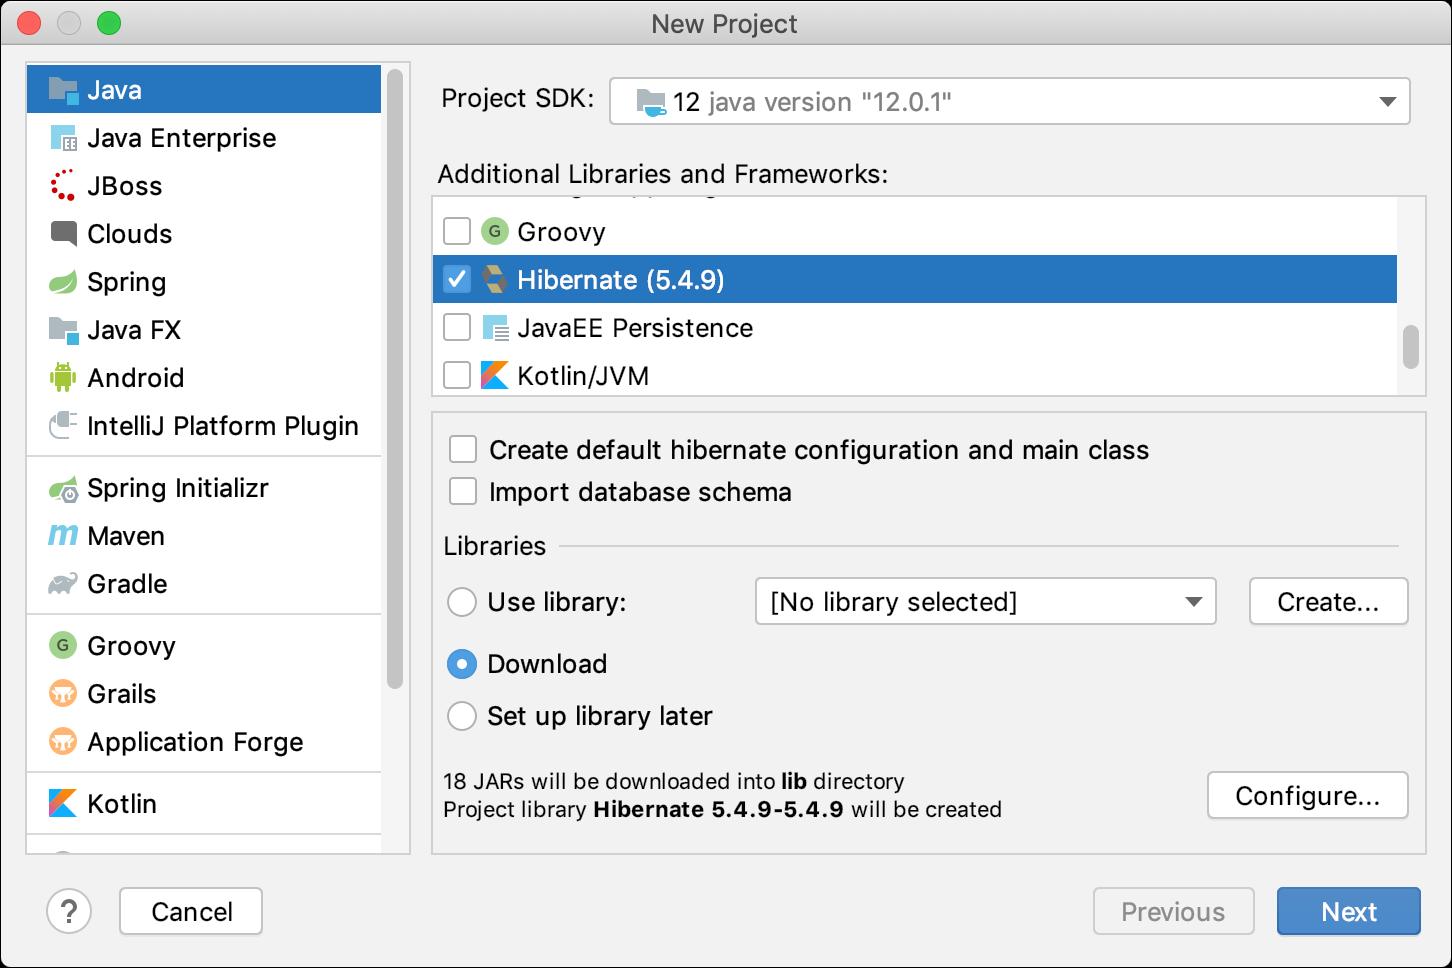 Creating a new Hibernate project